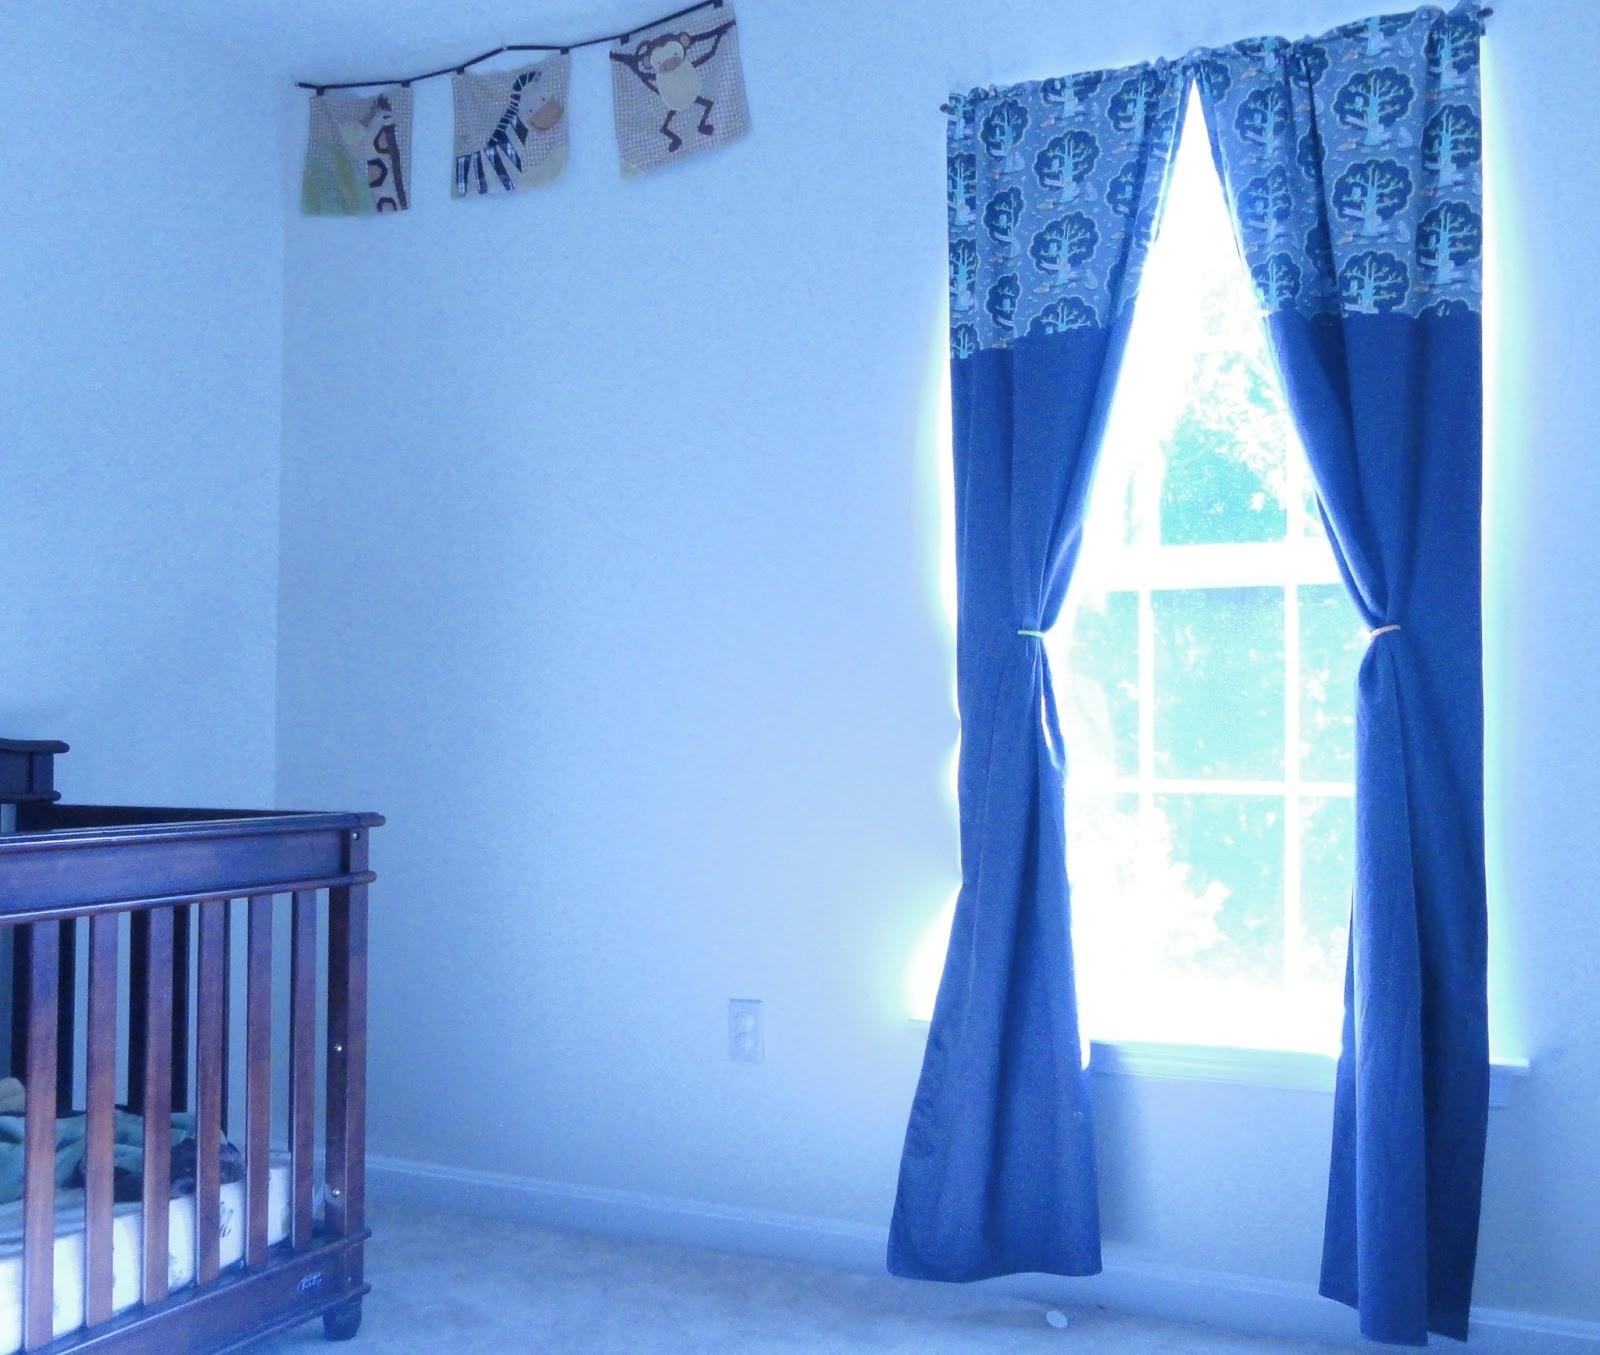 Nursery Makeover Part Iii Blackout Curtains Diy Danielle